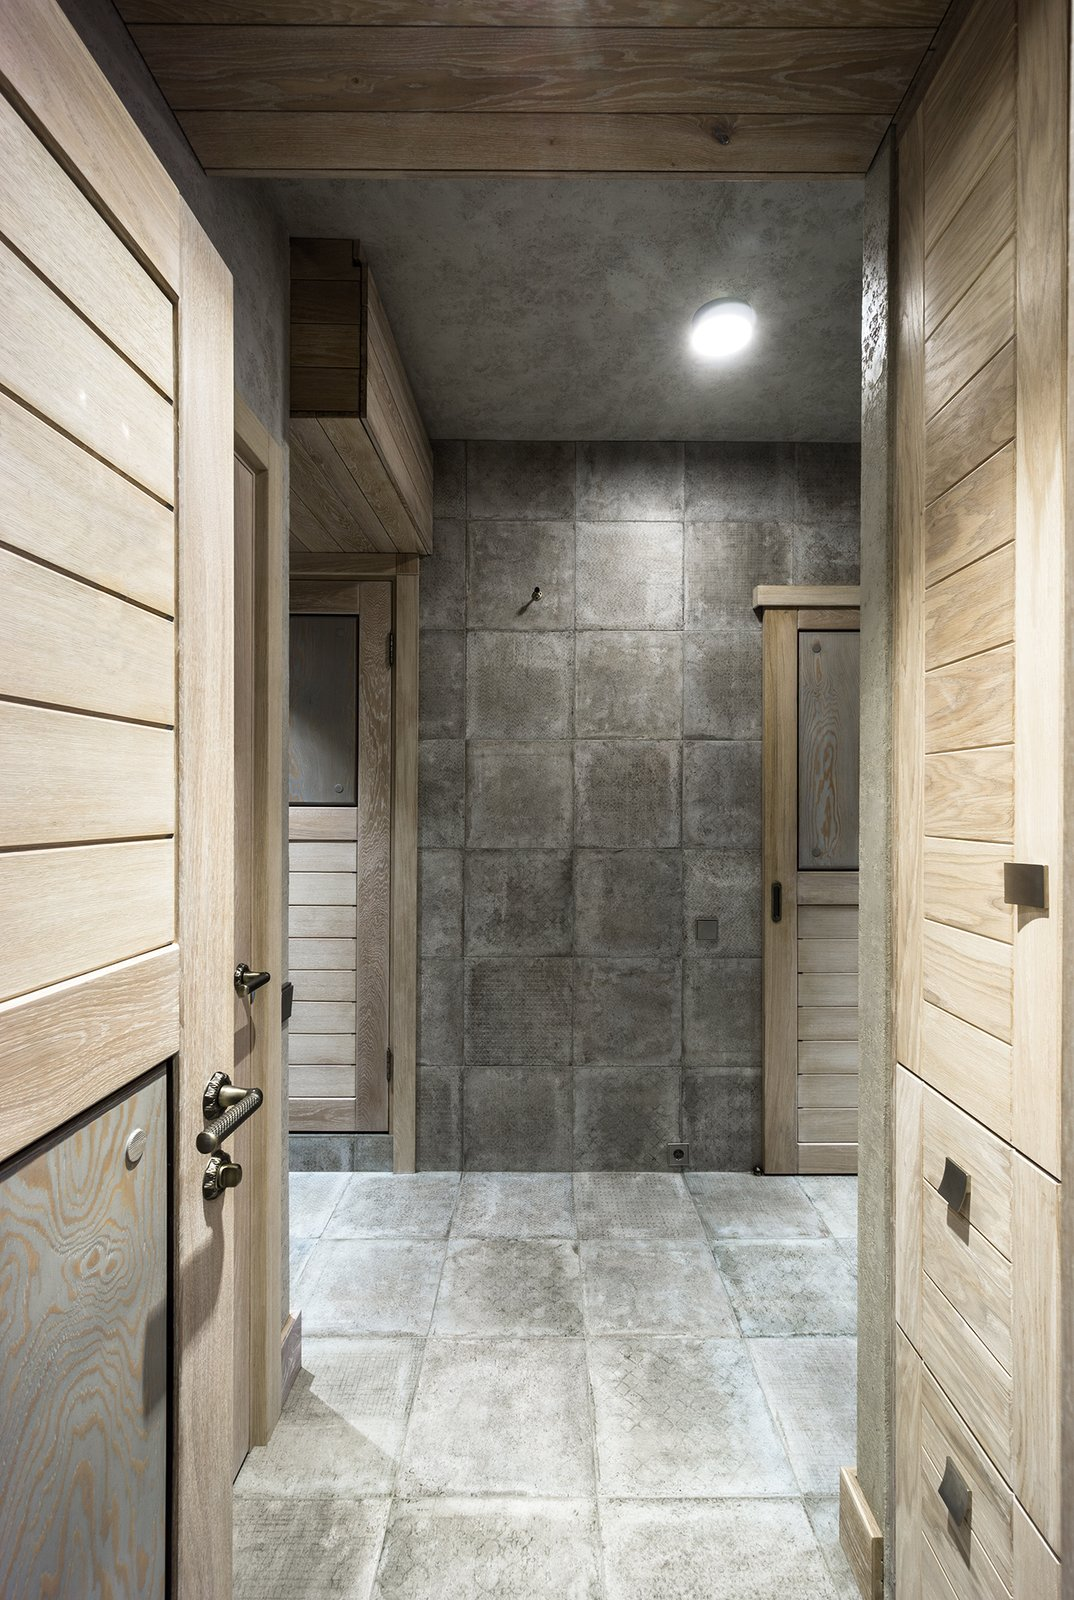 Hallway and Ceramic Tile Floor Hallway  NagatinSky by Alexey Rozenberg